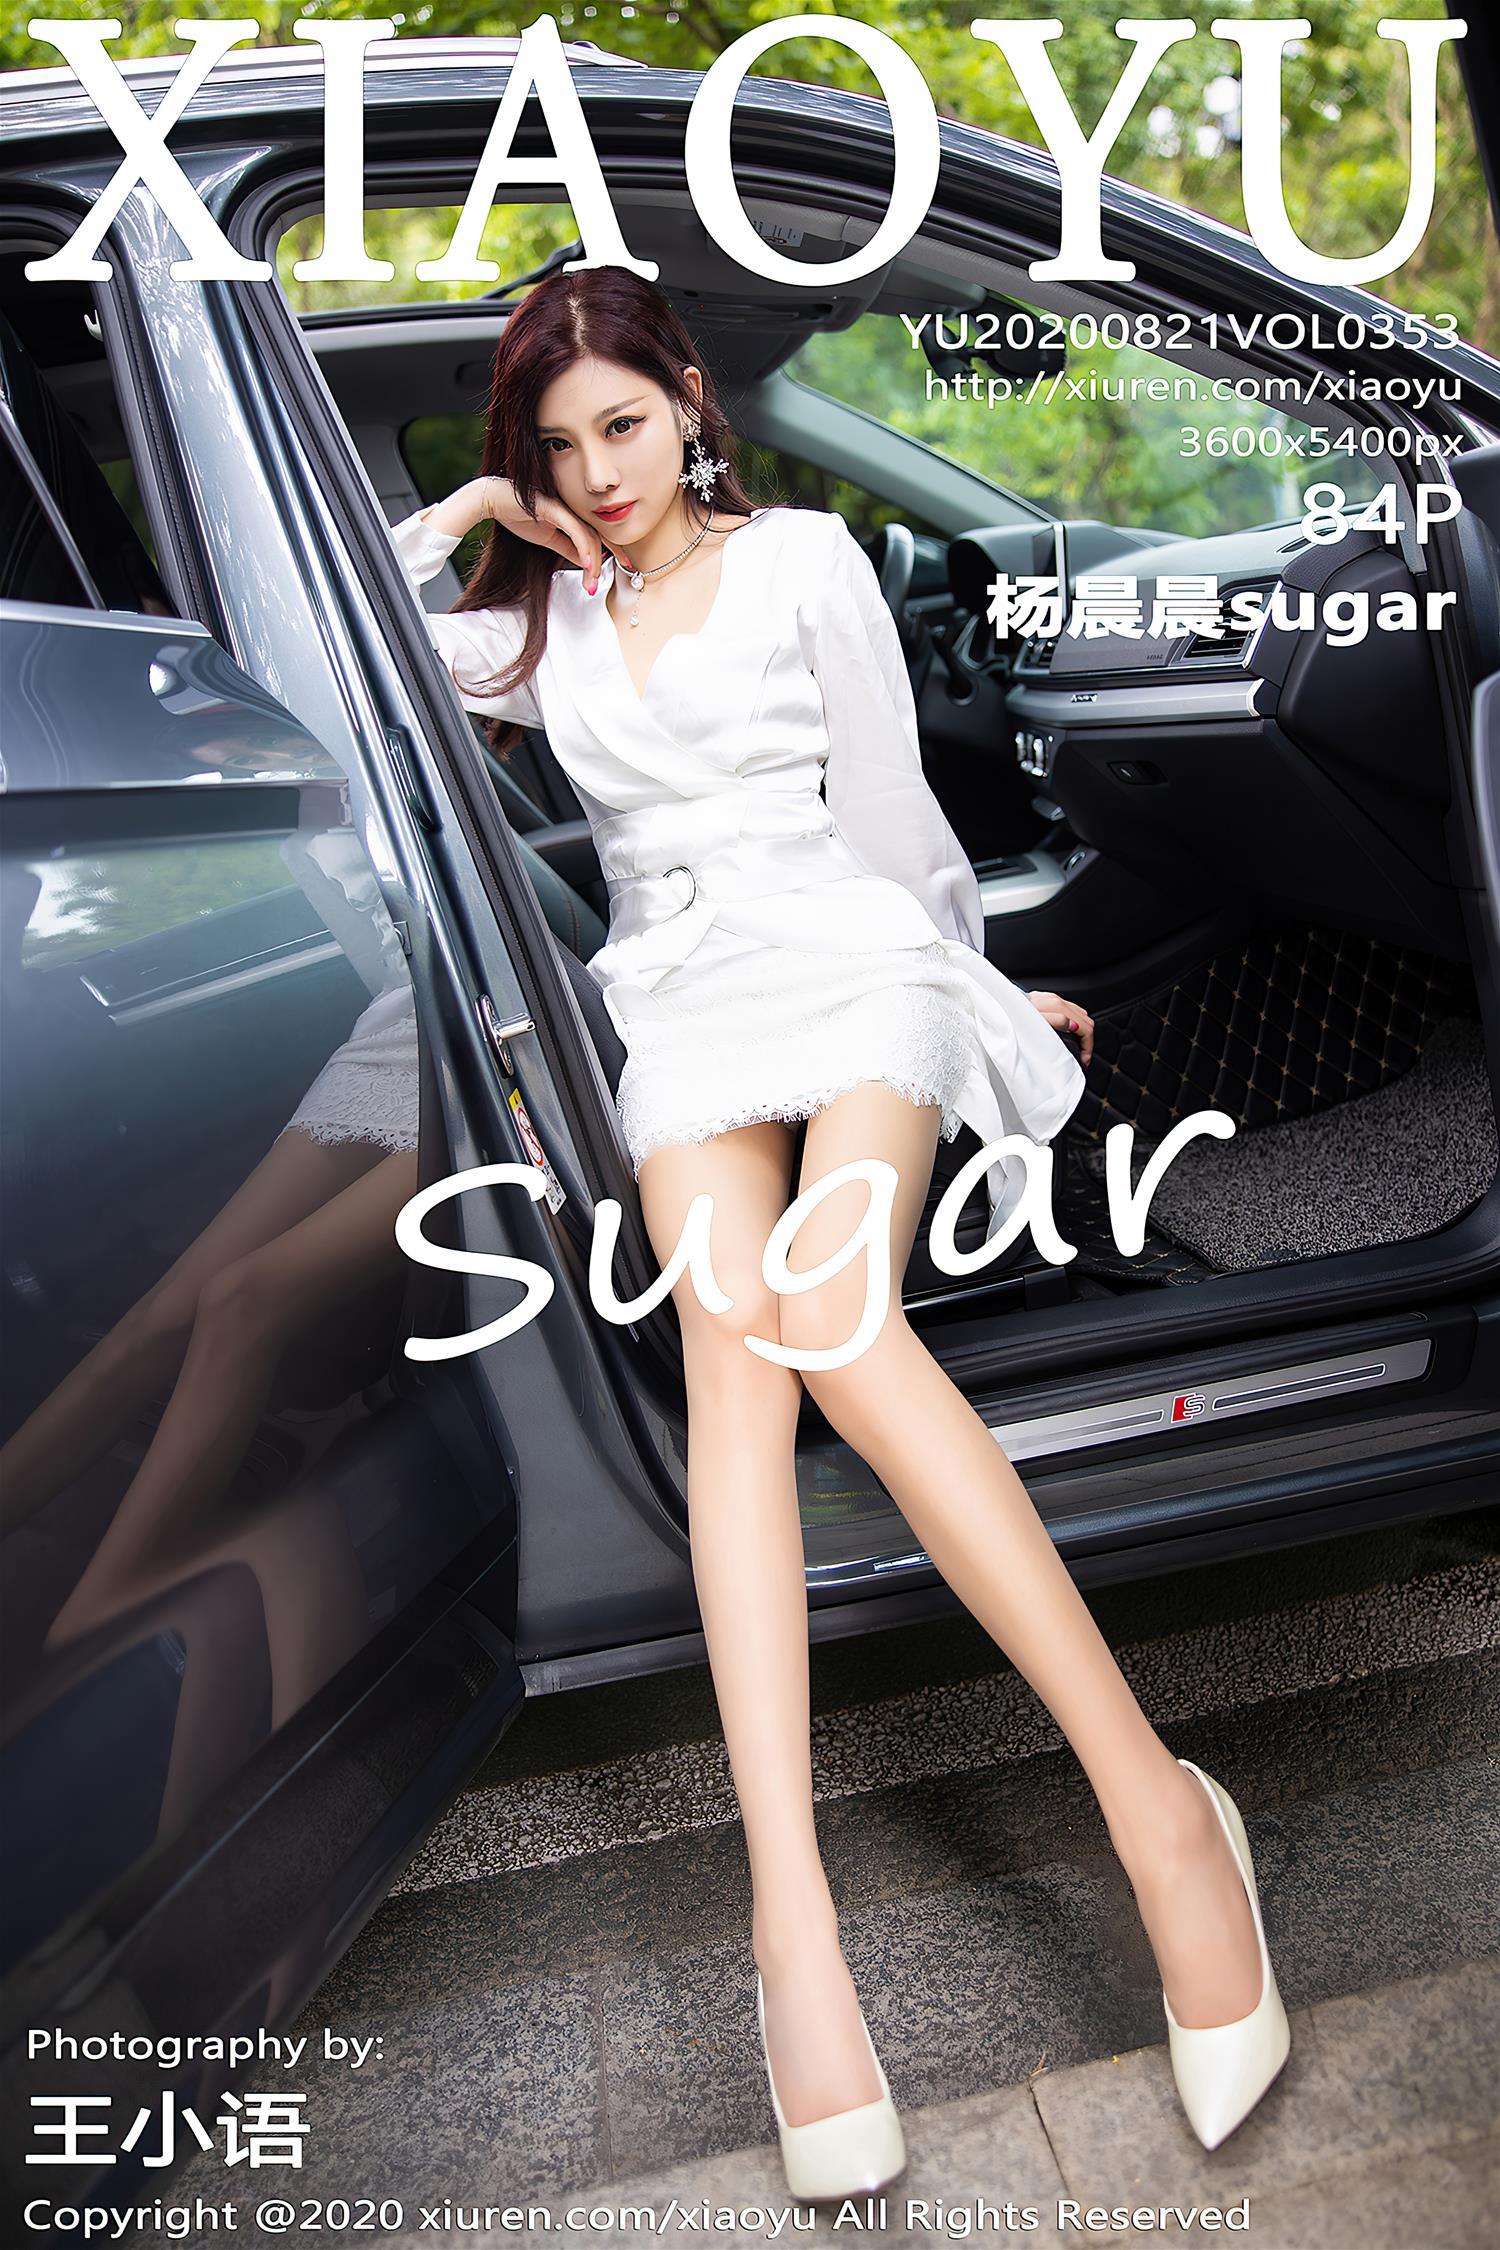 [XIAOYU语画界] 2020.08.21 VOL.353 杨晨晨sugar [85P]